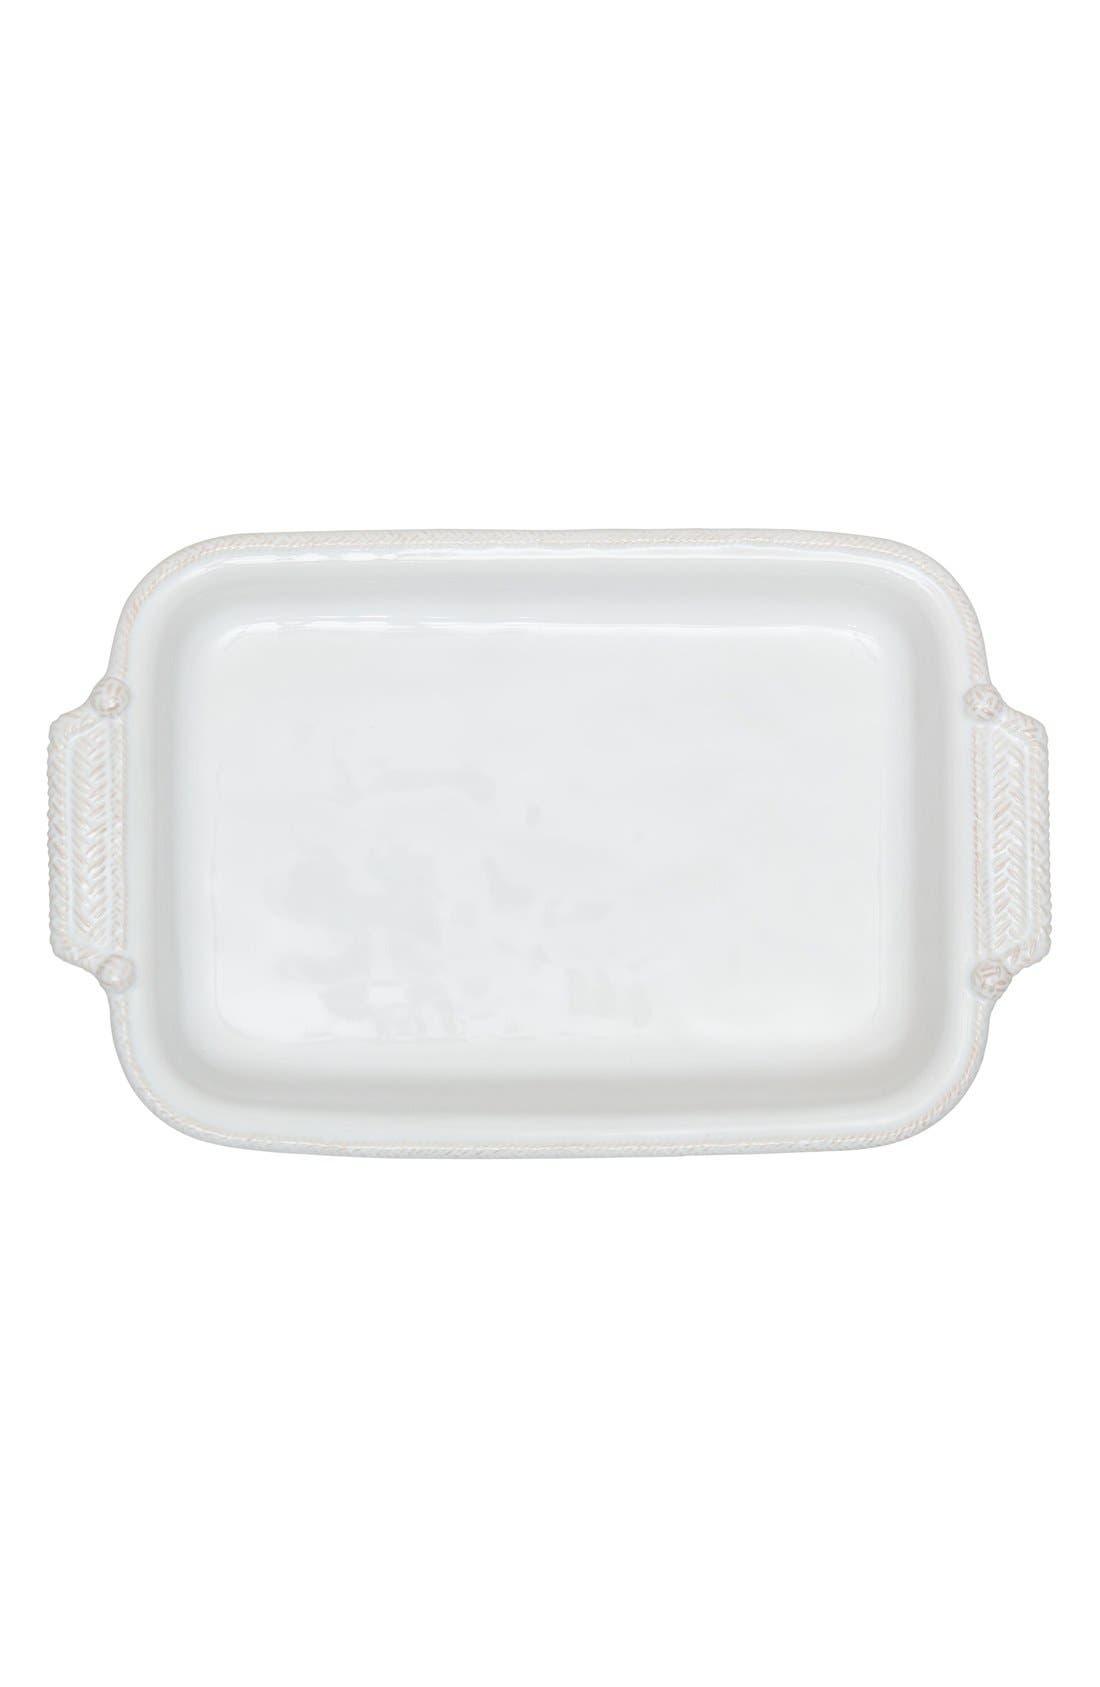 Le Panier 2.5-Quart Rectangular Baking Dish,                         Main,                         color,